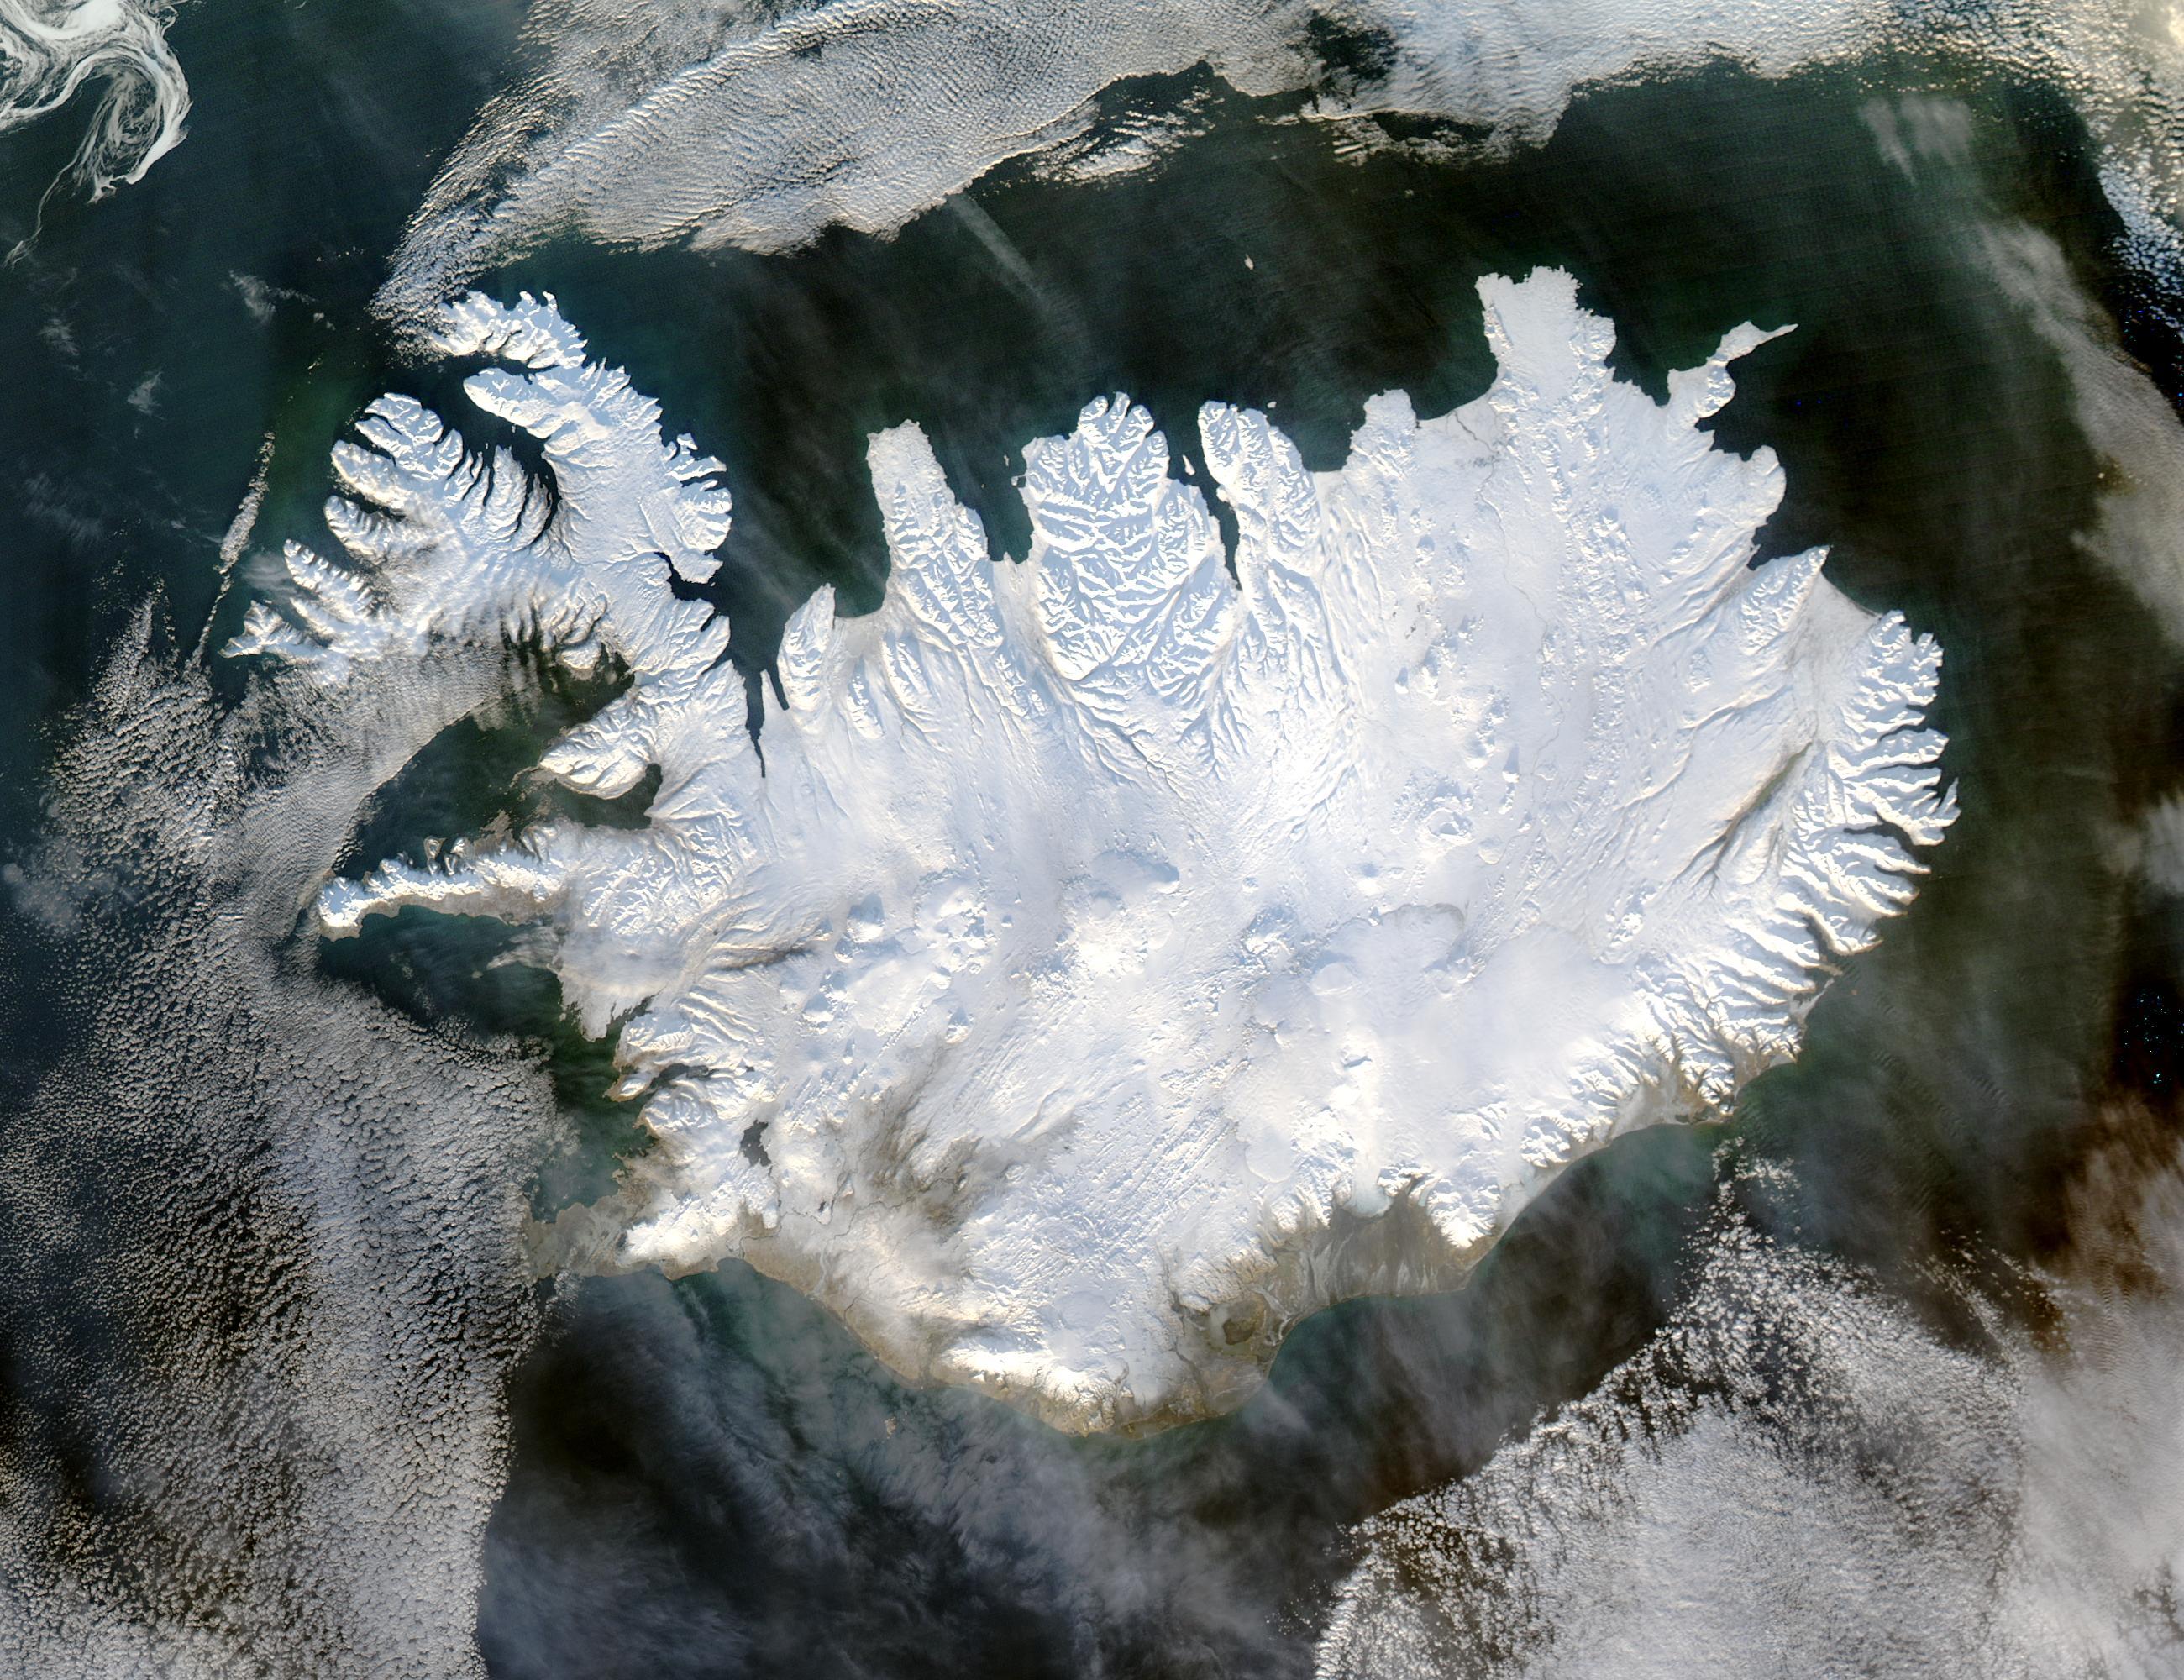 Tratamentul comun al Islandei tratamentul artrozei fermatron plus